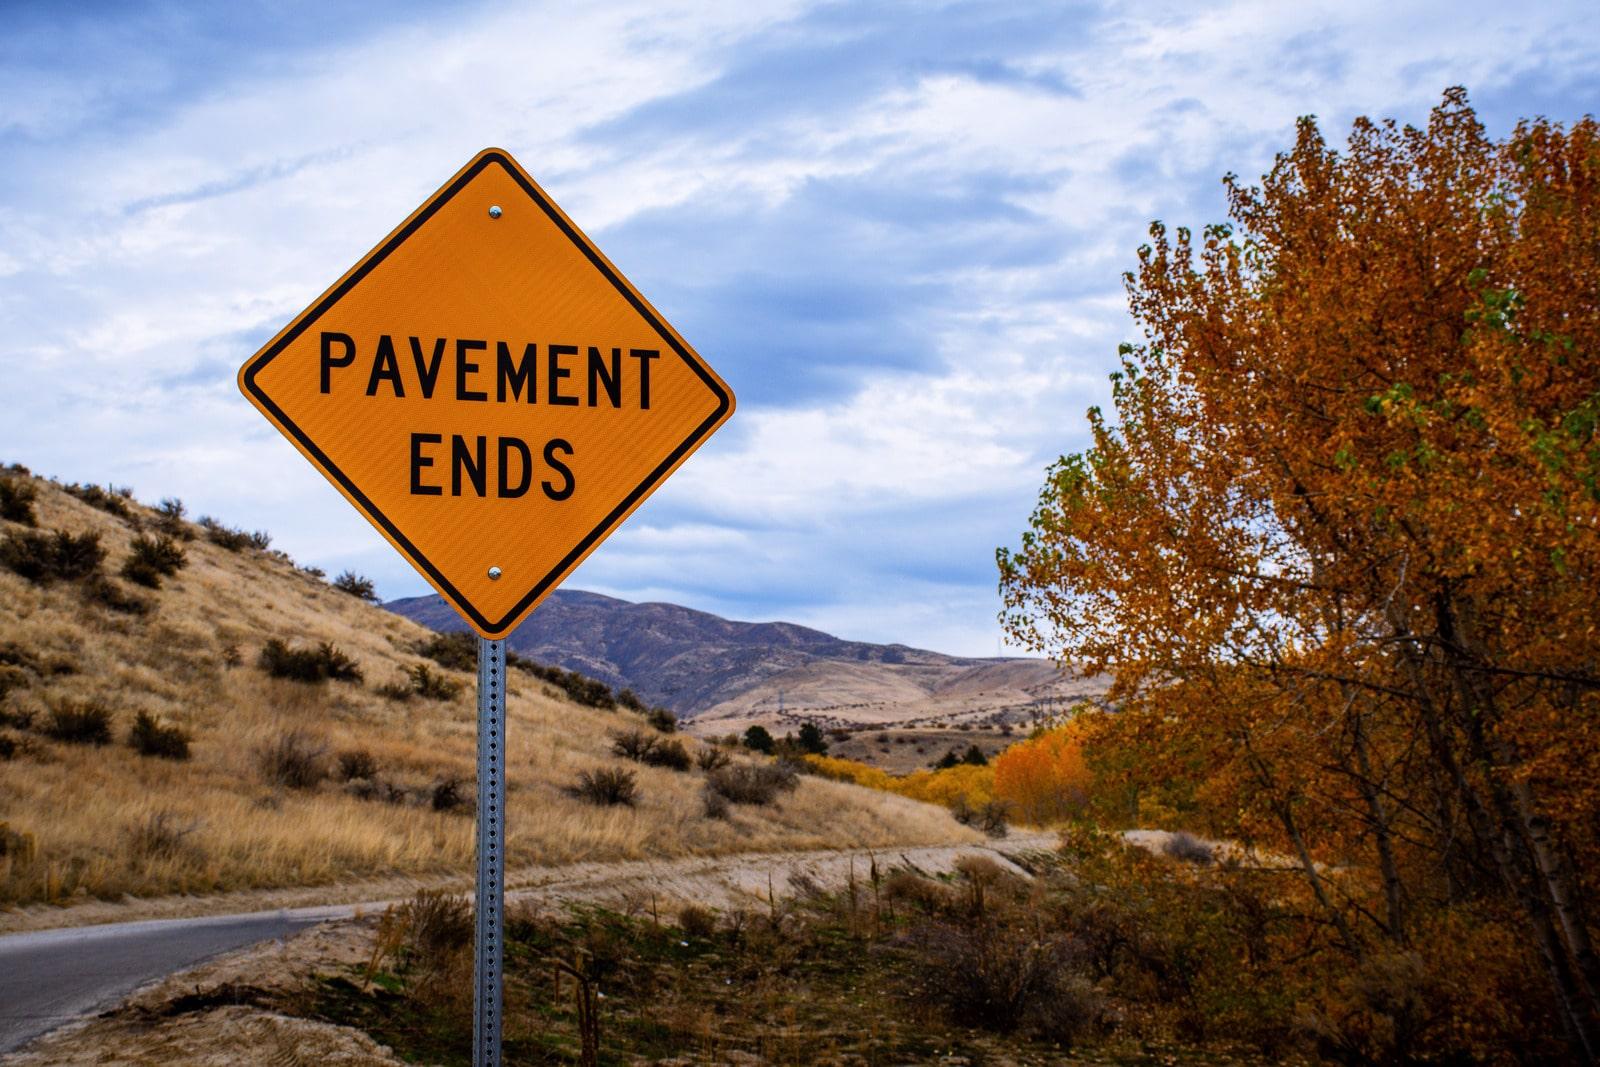 Foto von Brett Sayles: https://www.canva.com/photos/MADyRuP7agI-pavement-ends-road-signage/